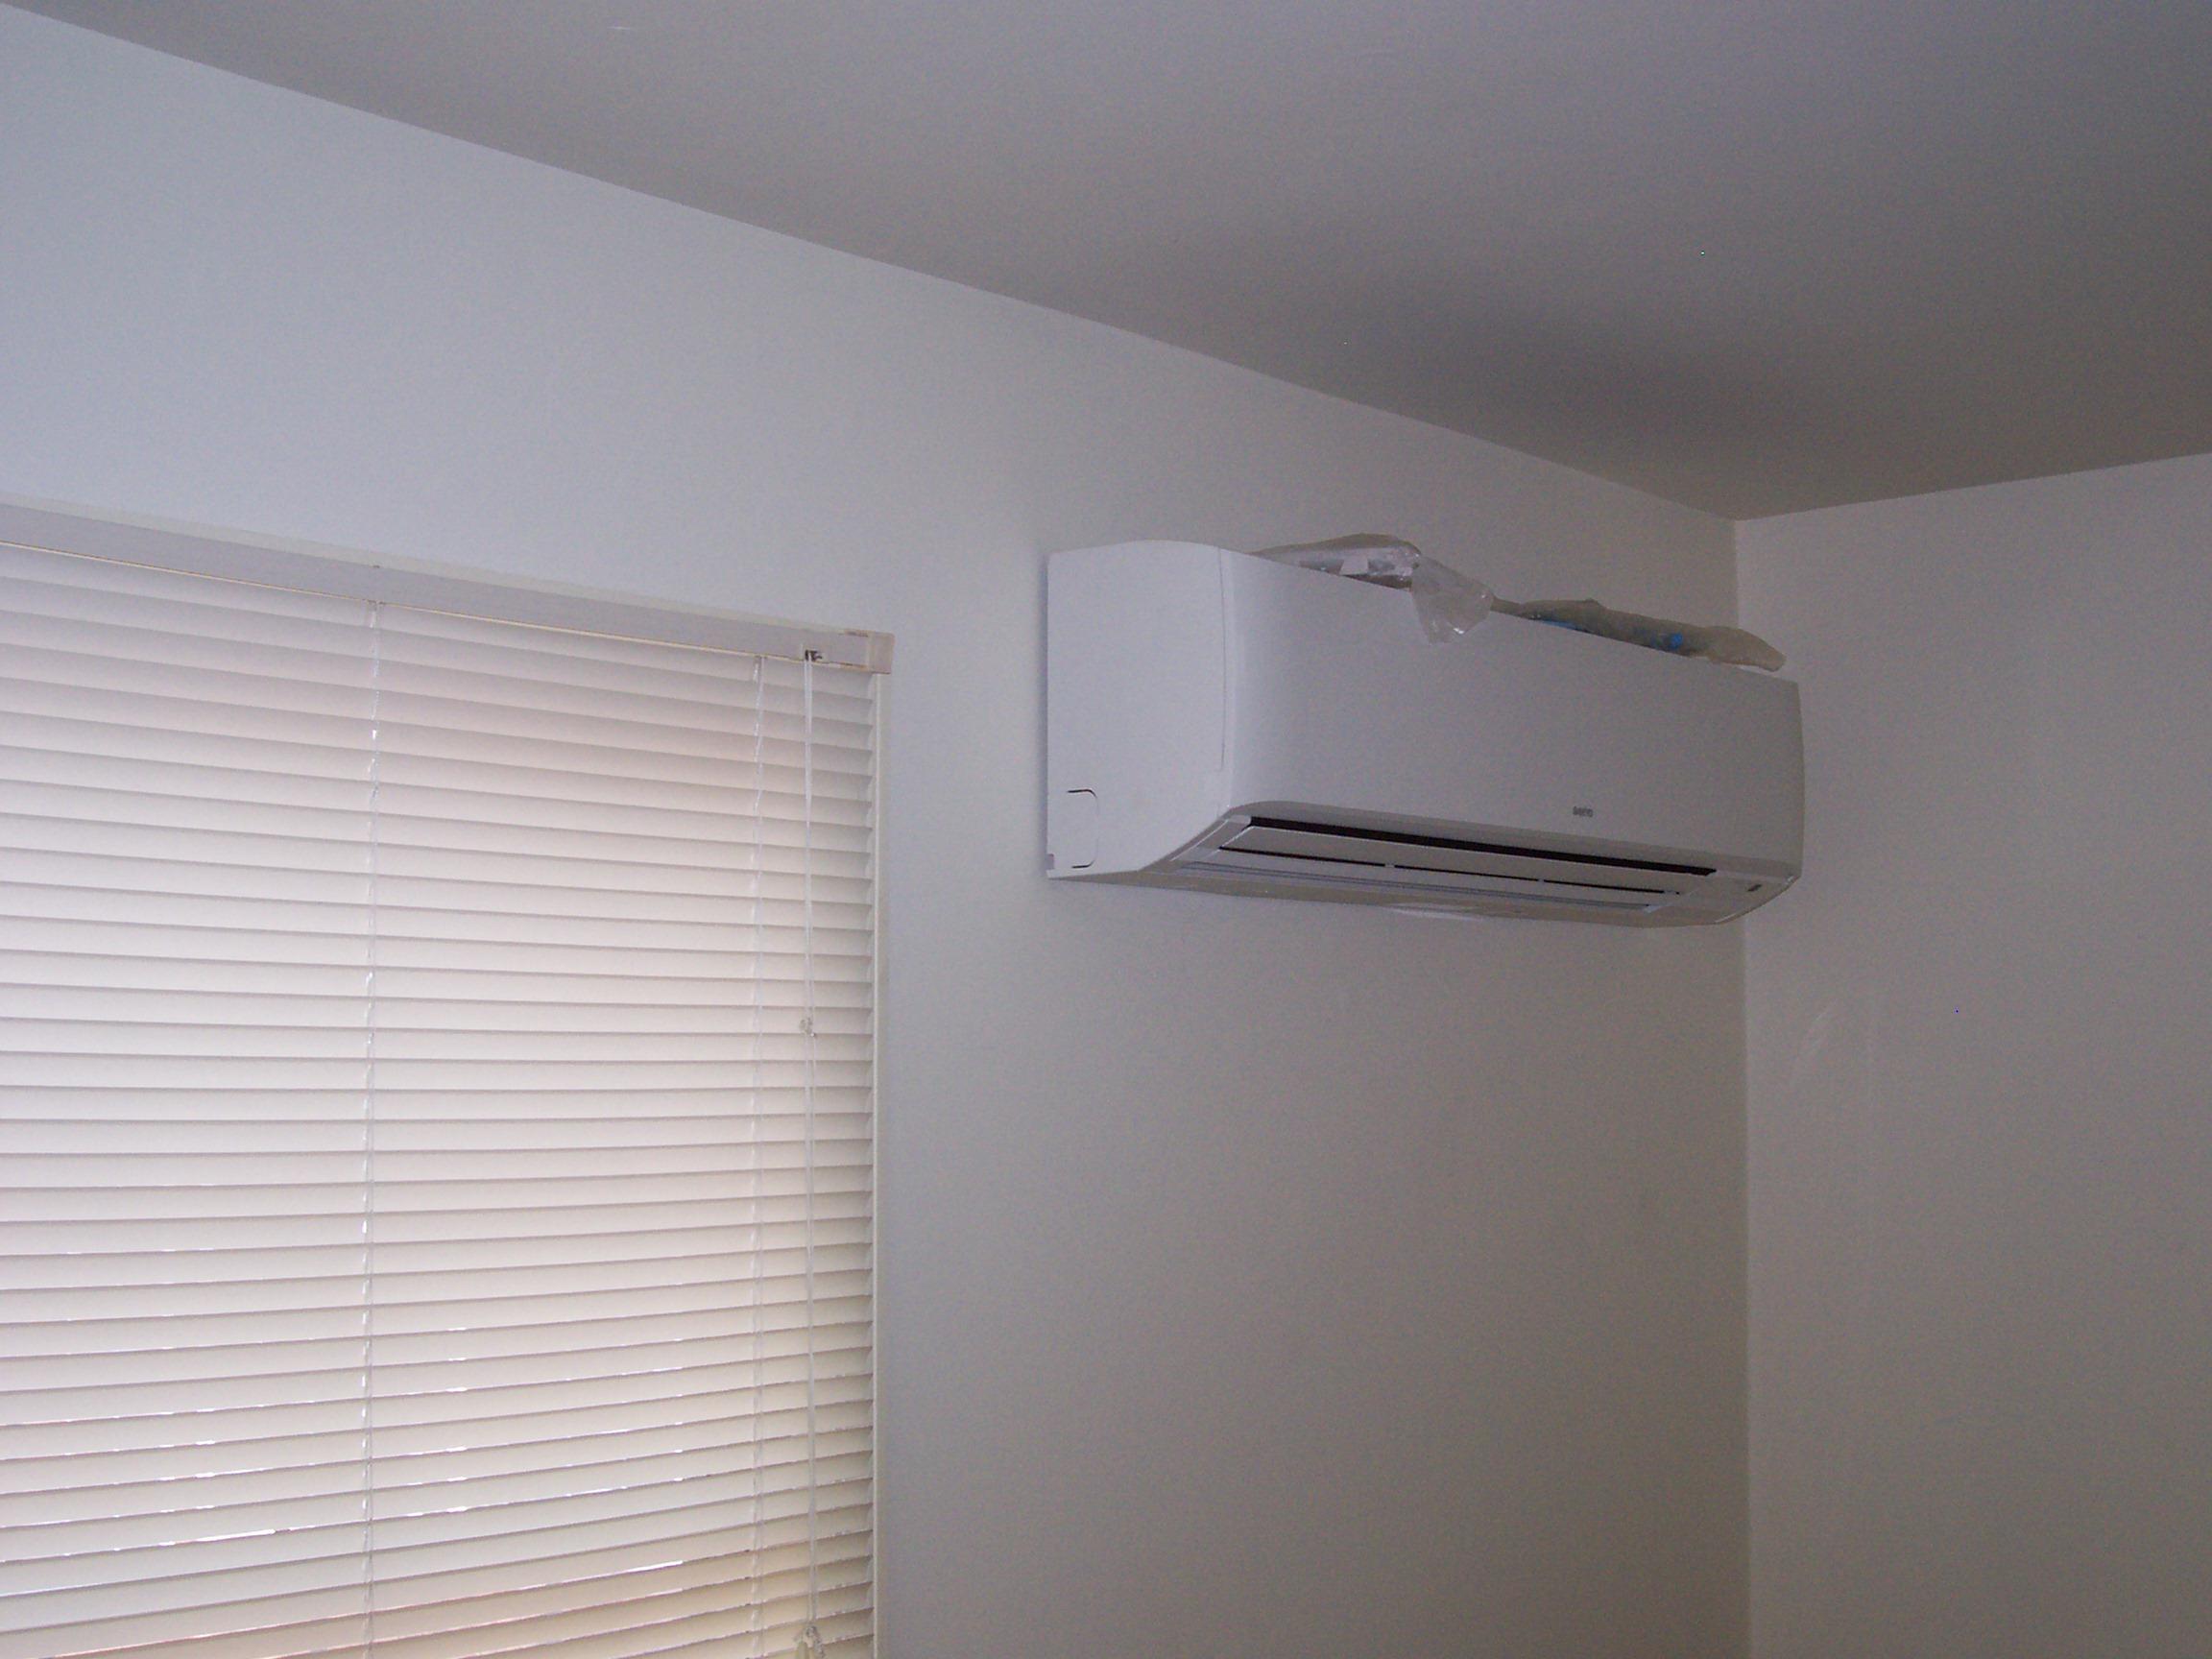 Ductless A/C Evaporator Unit